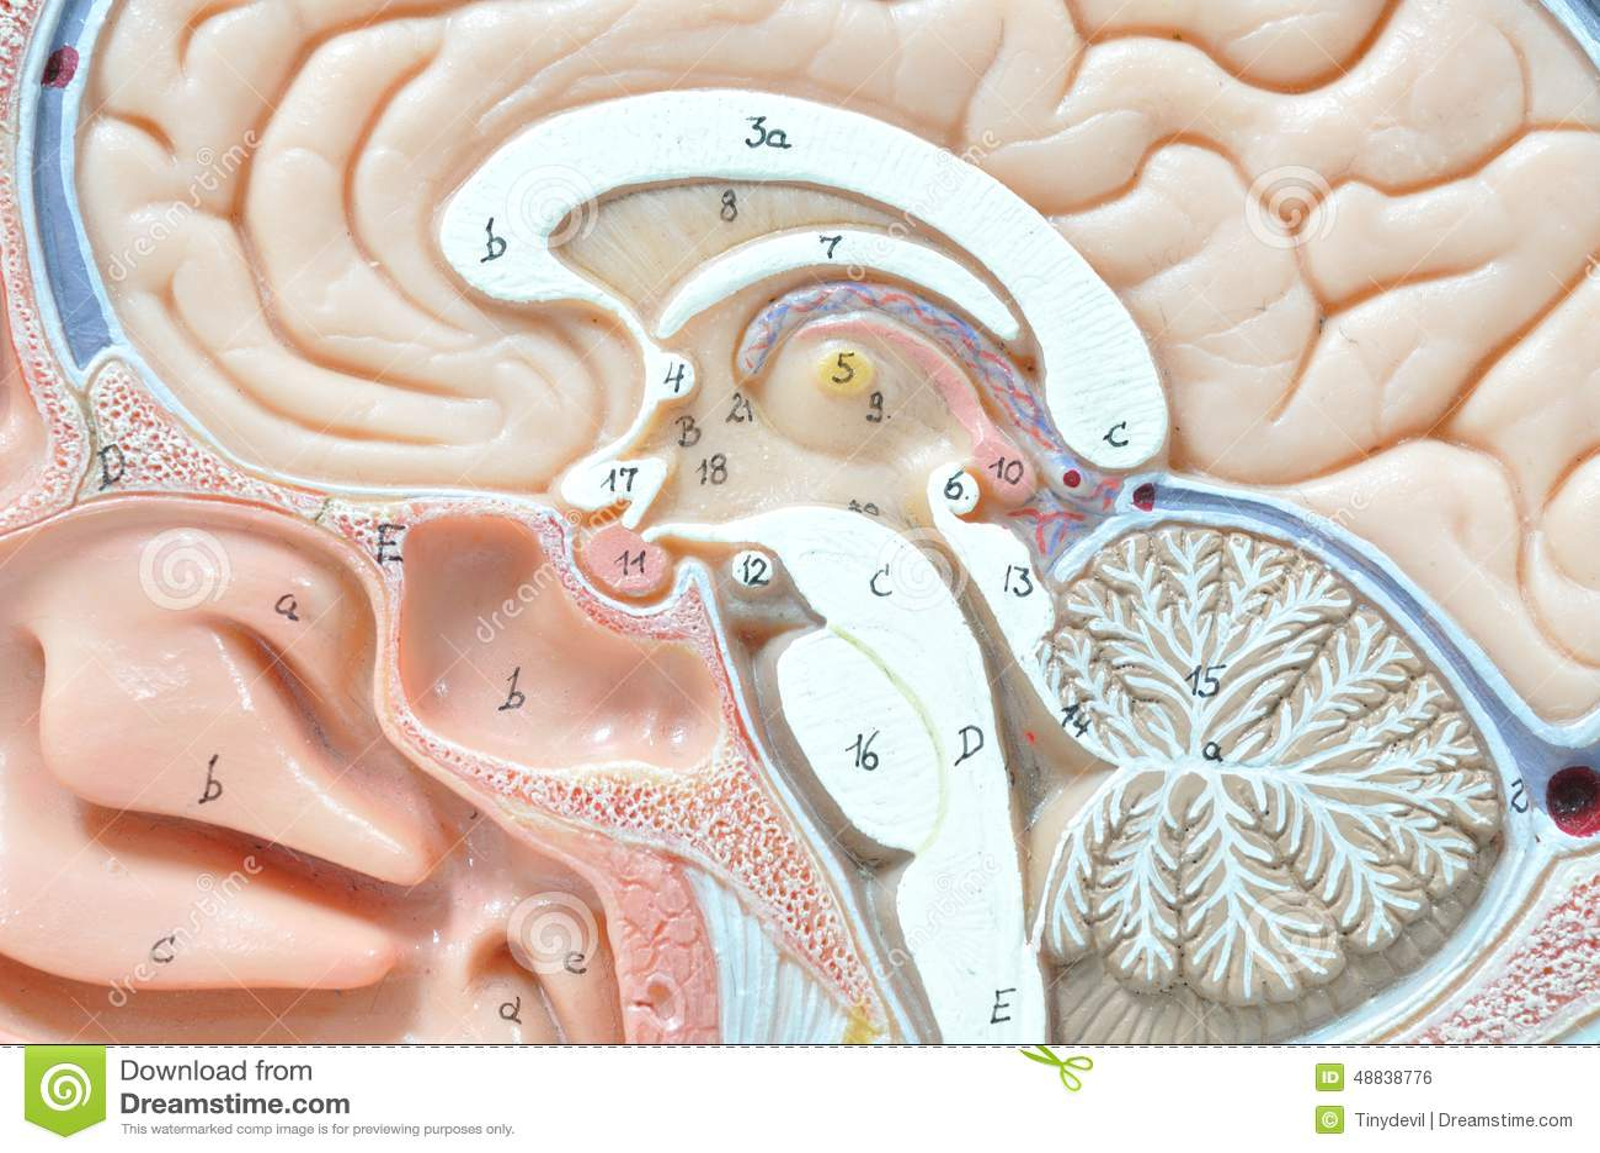 Human Brain Model Stock Photo Image Of Intellectual 48838776